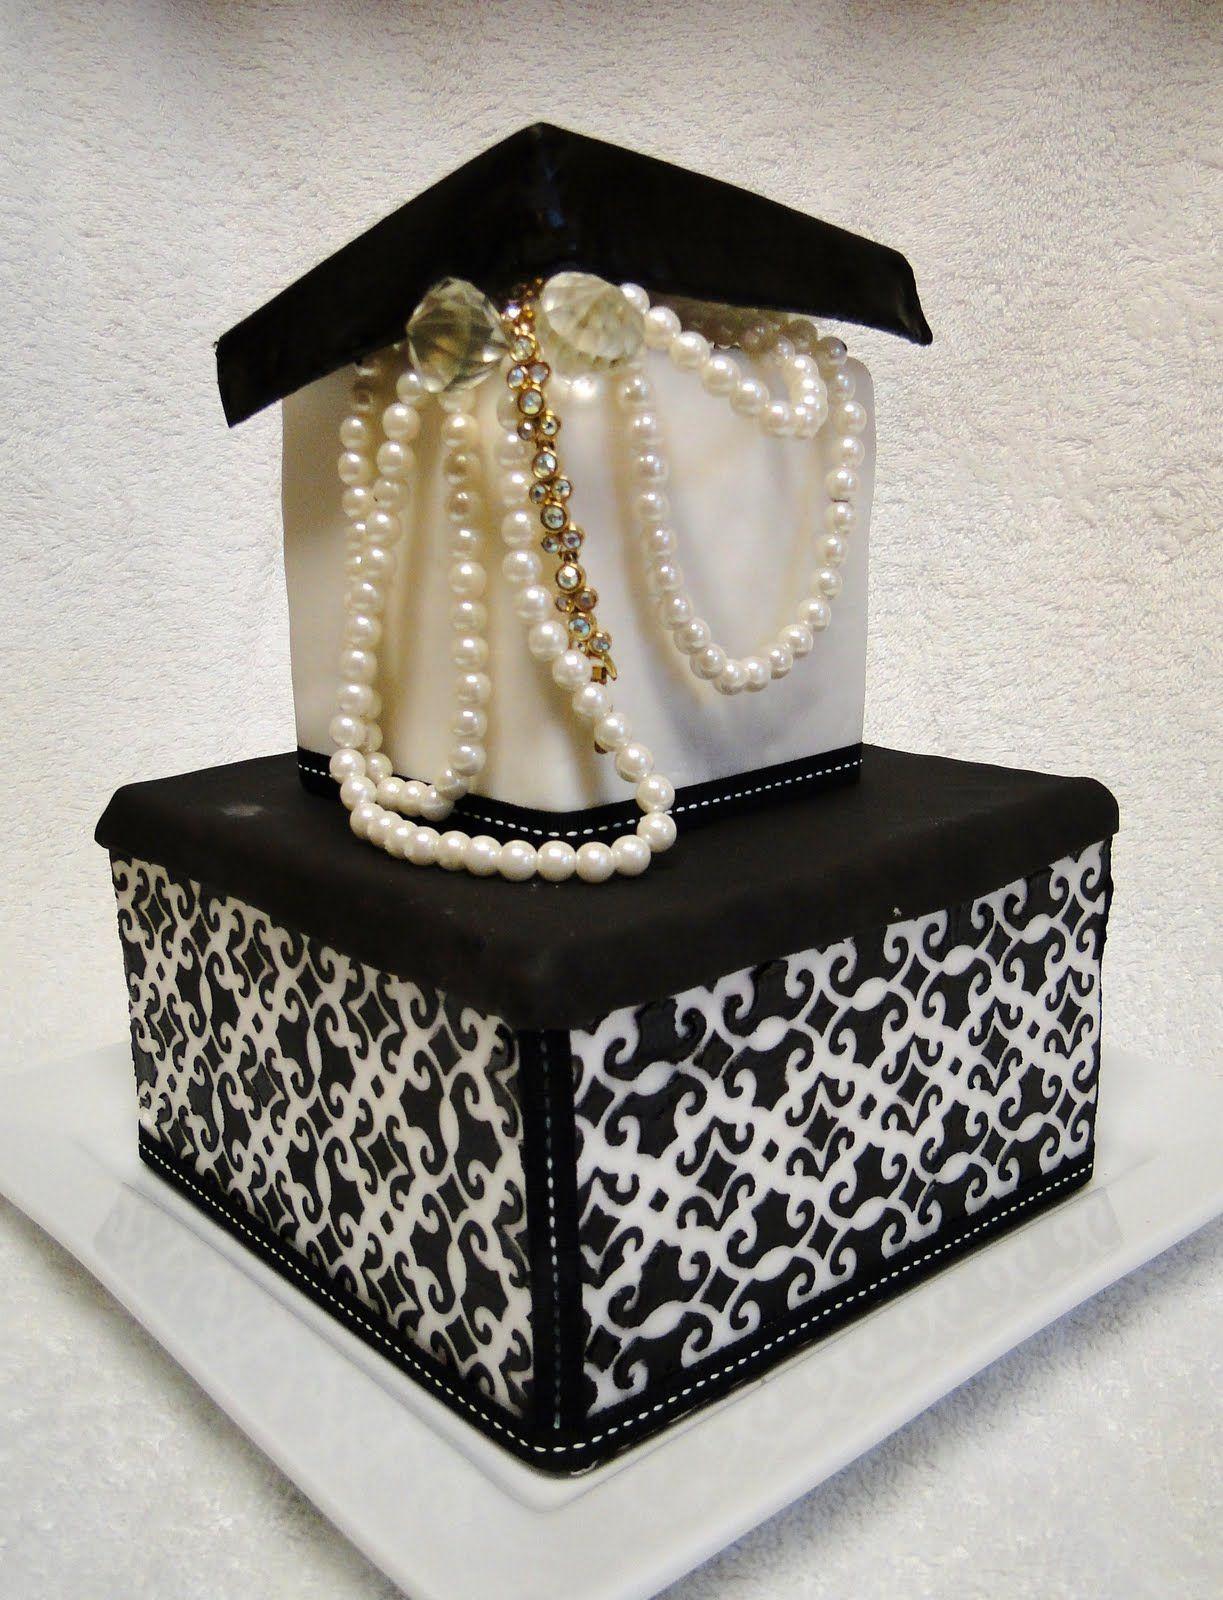 Gift Box A cake for a classy woman! Description